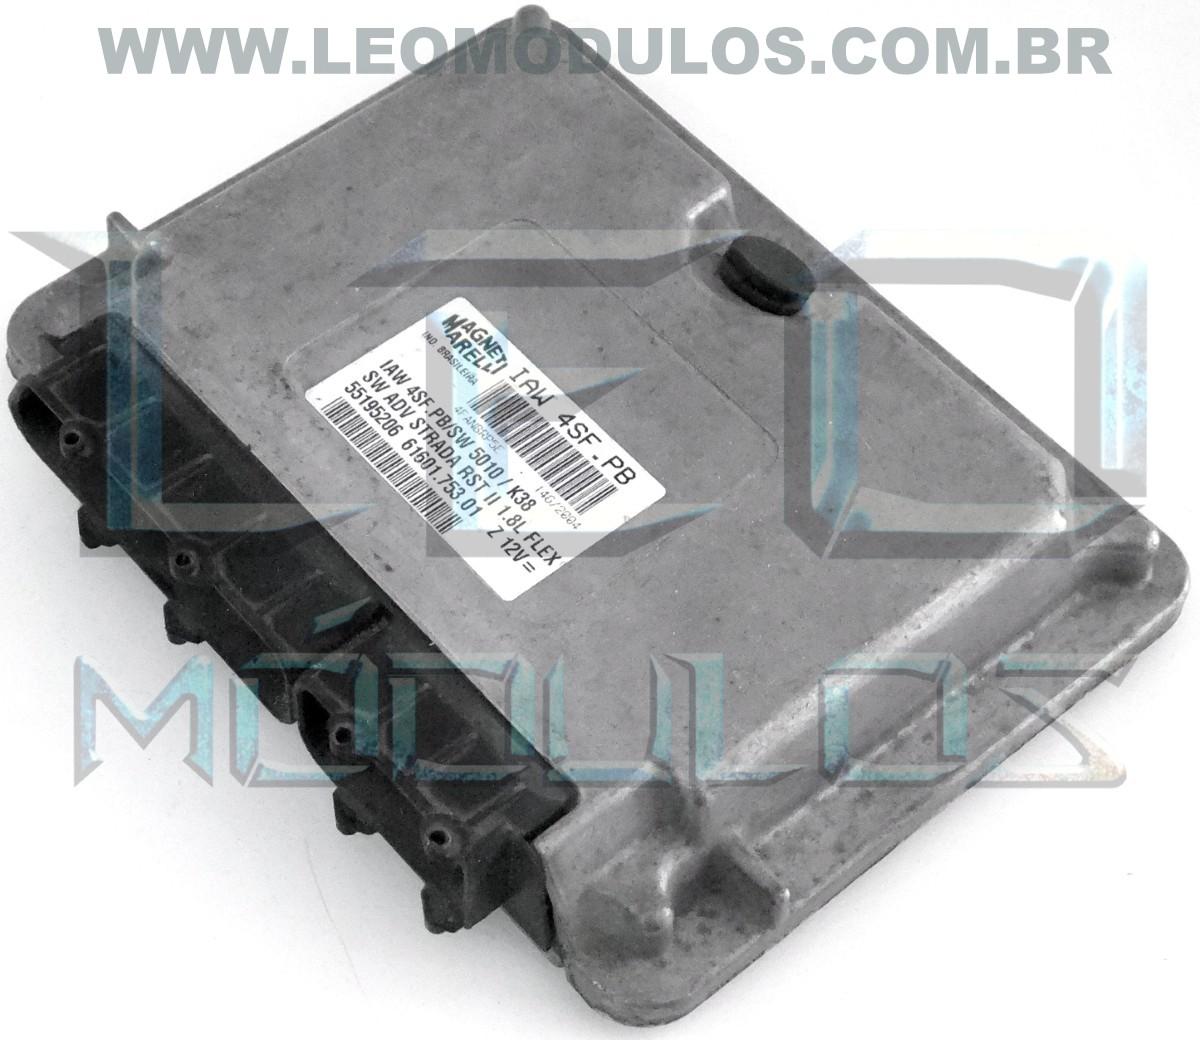 Módulo de injeção marelli - IAW 4SF.PB - 55195206 - Fiat Strada 1.8 8V Flex - 61601.753.01 IAW 4SFPB - Leo Módulos